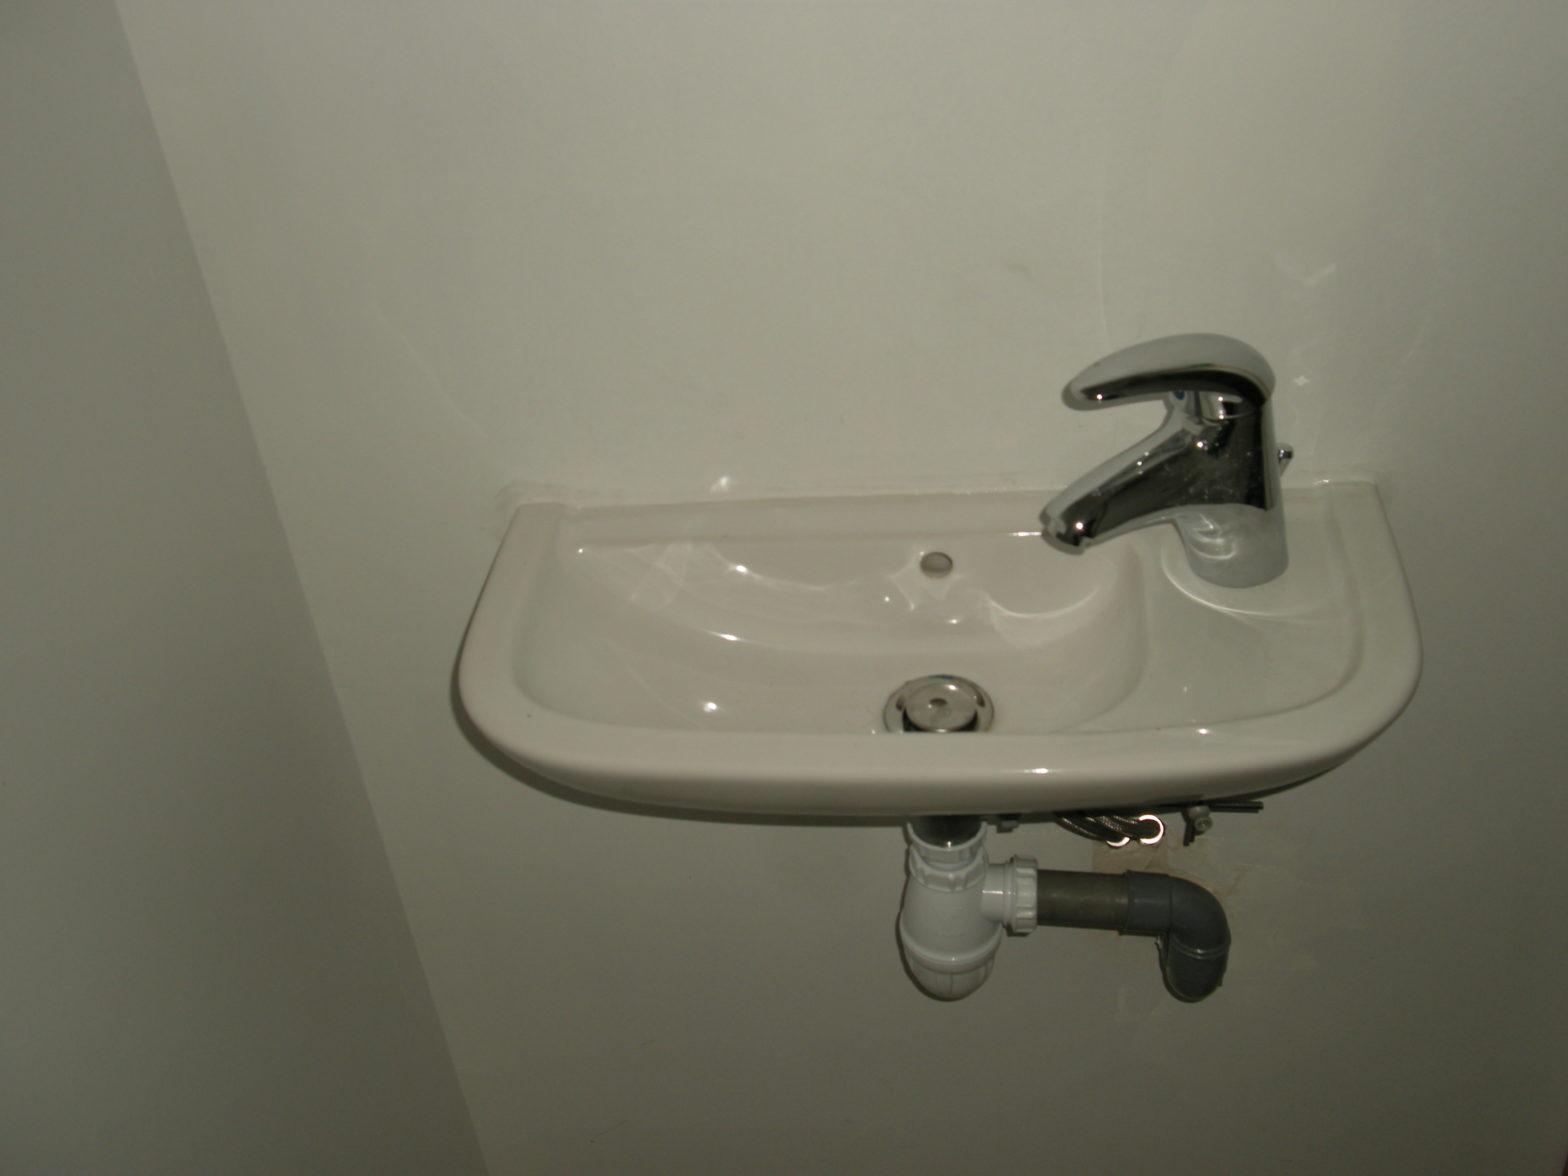 sanitaire faience evier lavabo concerto lave main cedeo 49800 sarrigné